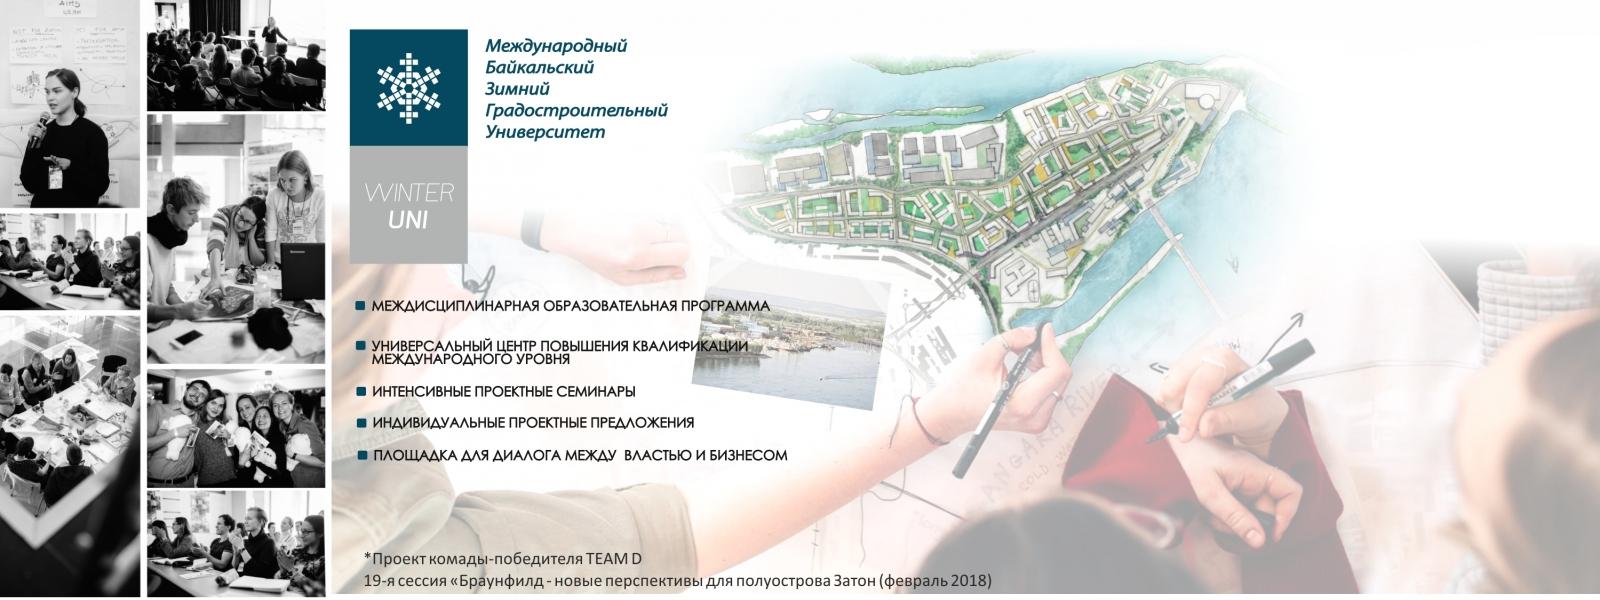 "work-Градостроительный воркшоп ""Международный Байкальский зимний градостроительный университет"" (International Baikal Winter University Of Urban Planning)"